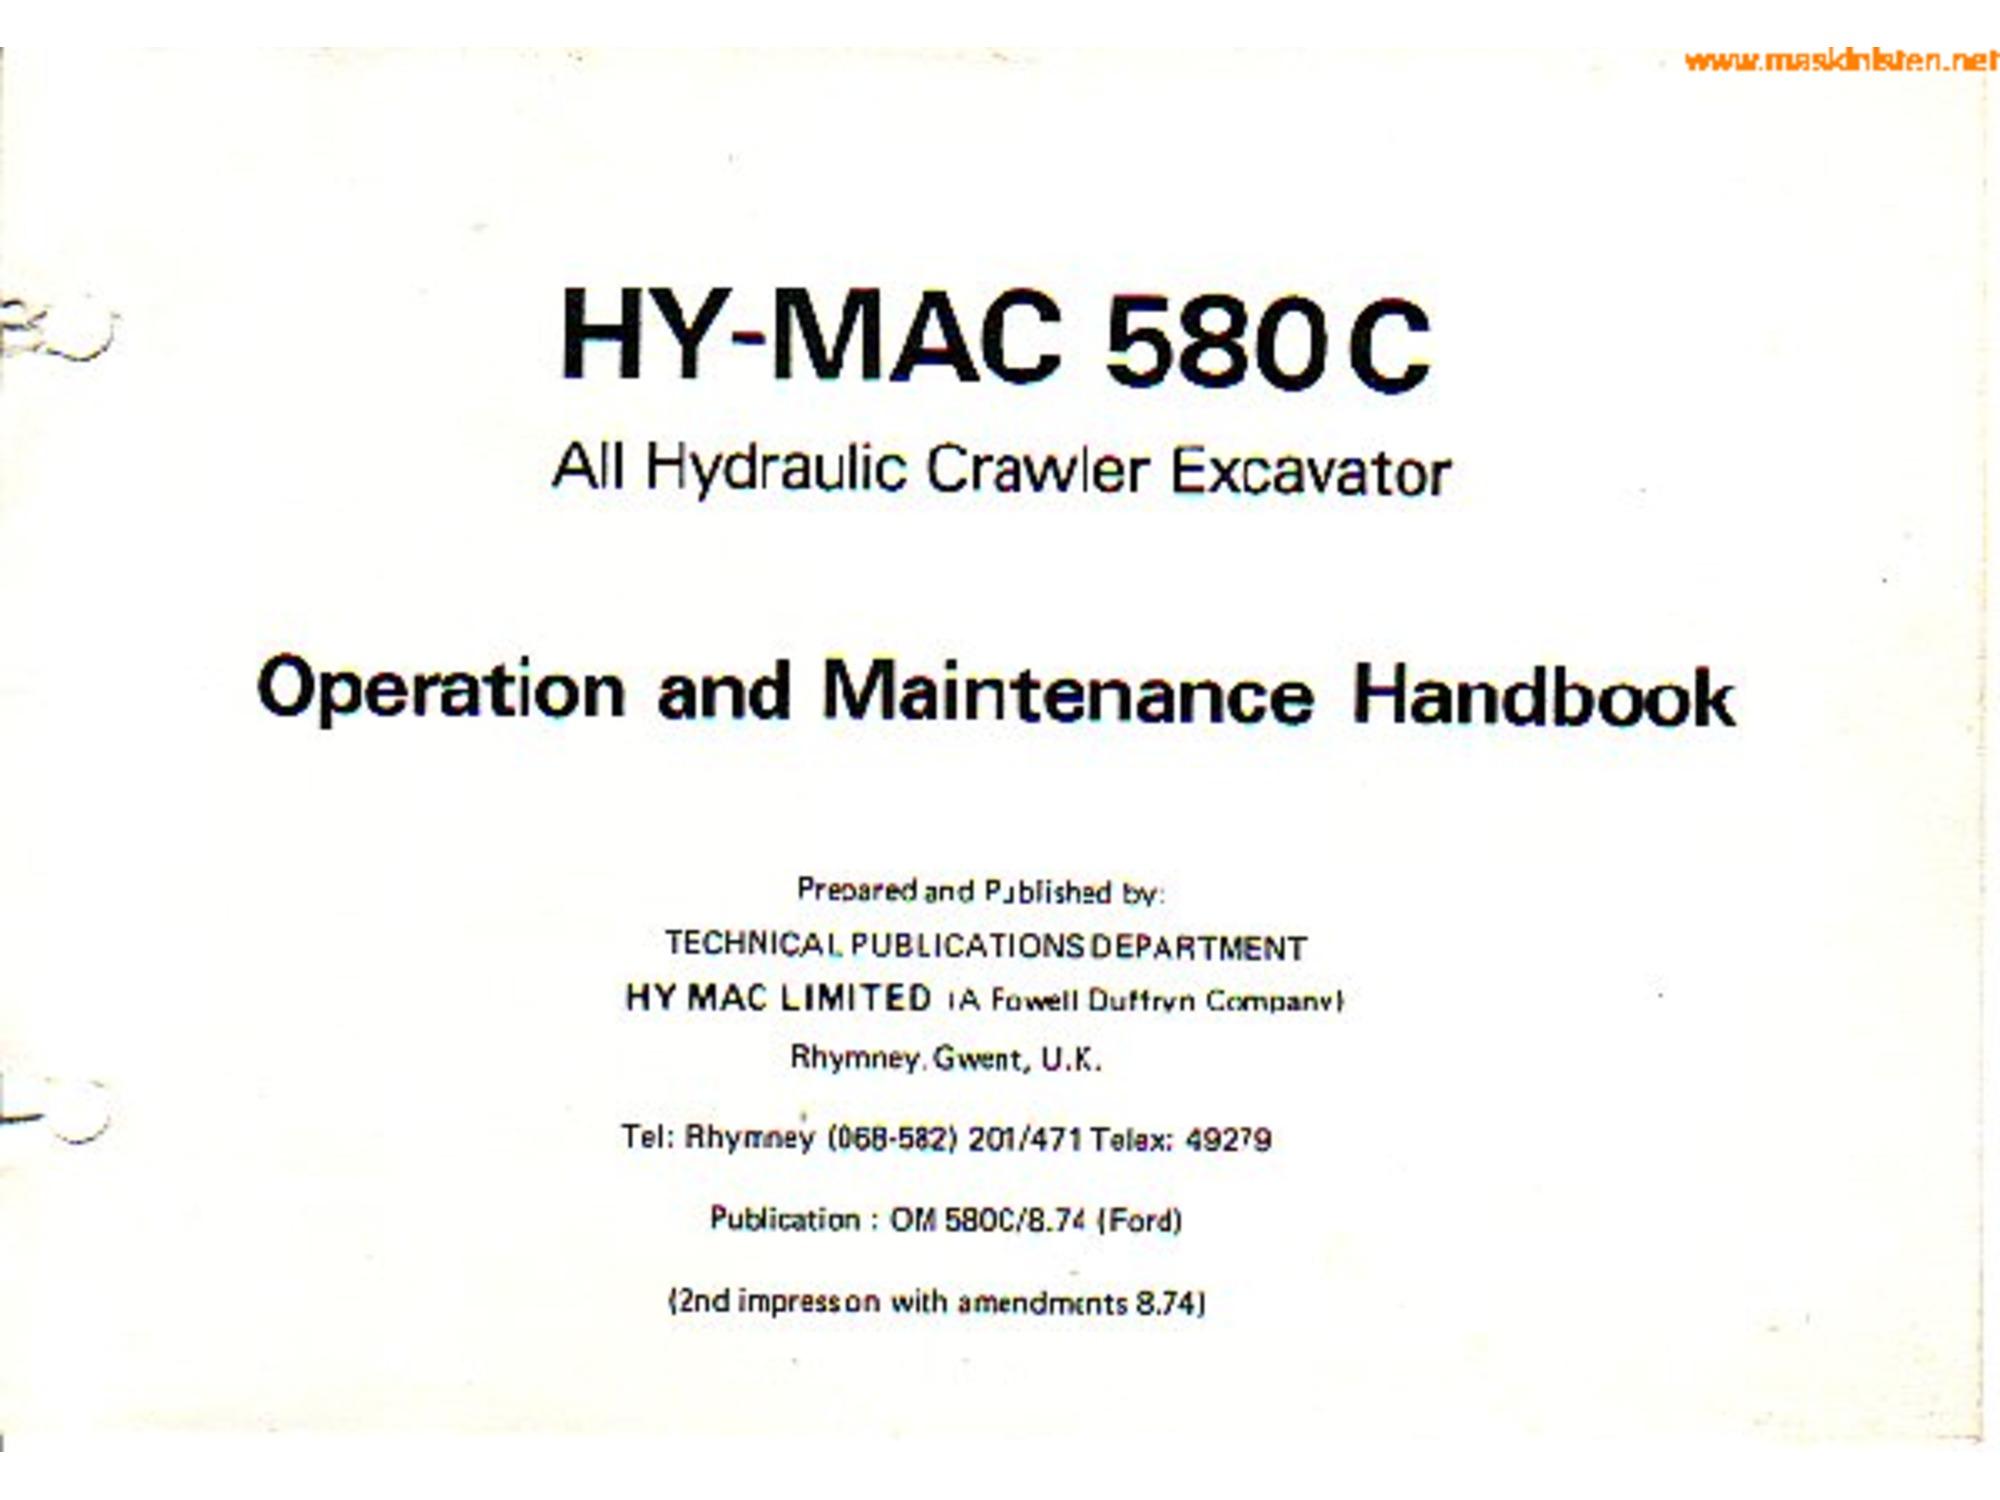 Hymac 580C operation and maintenance handbook